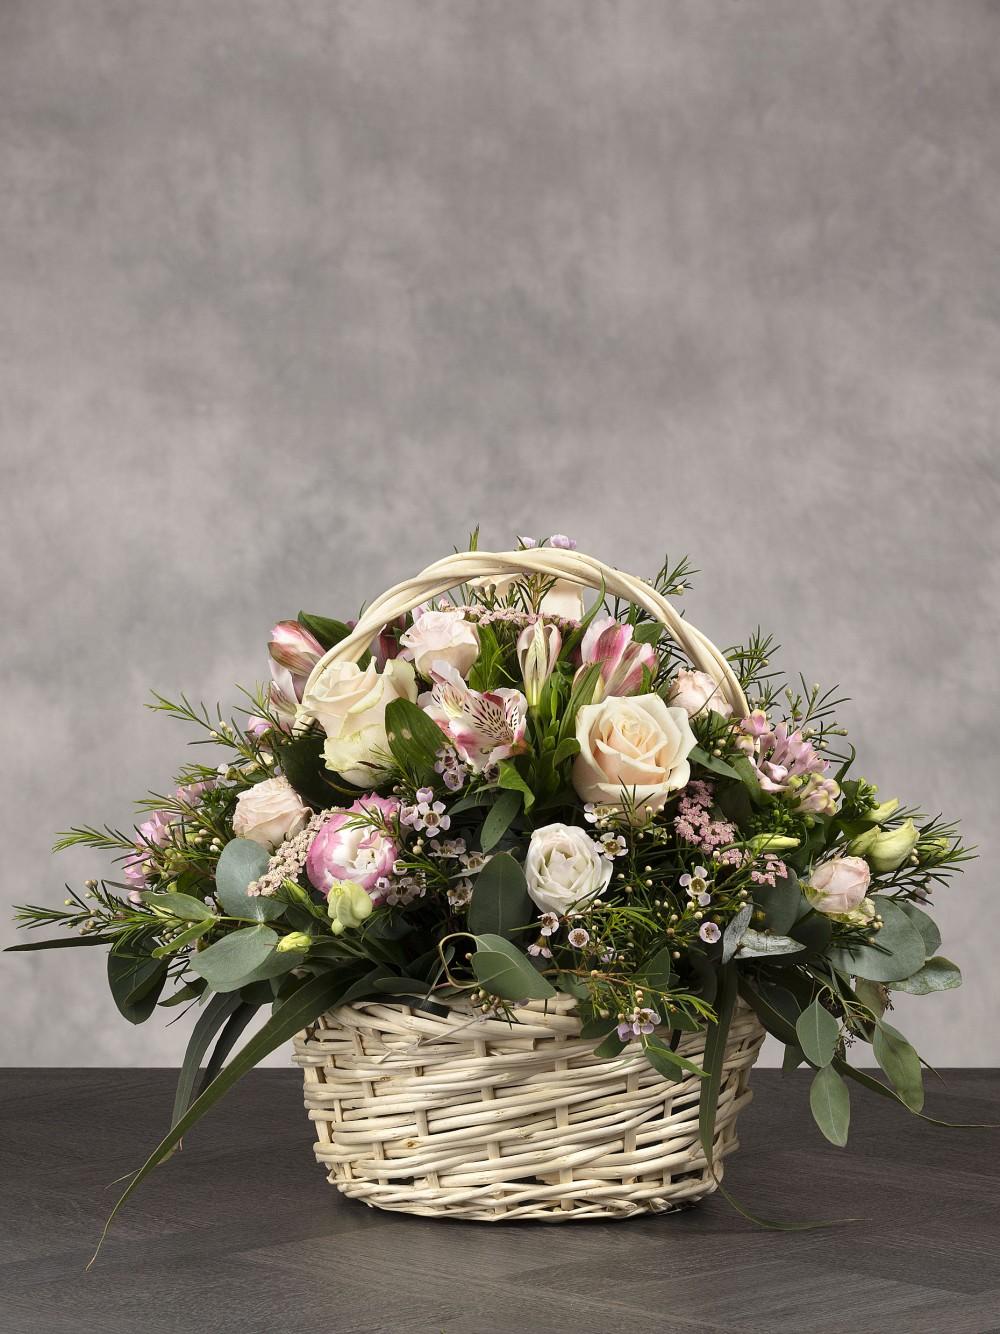 Amour Basket